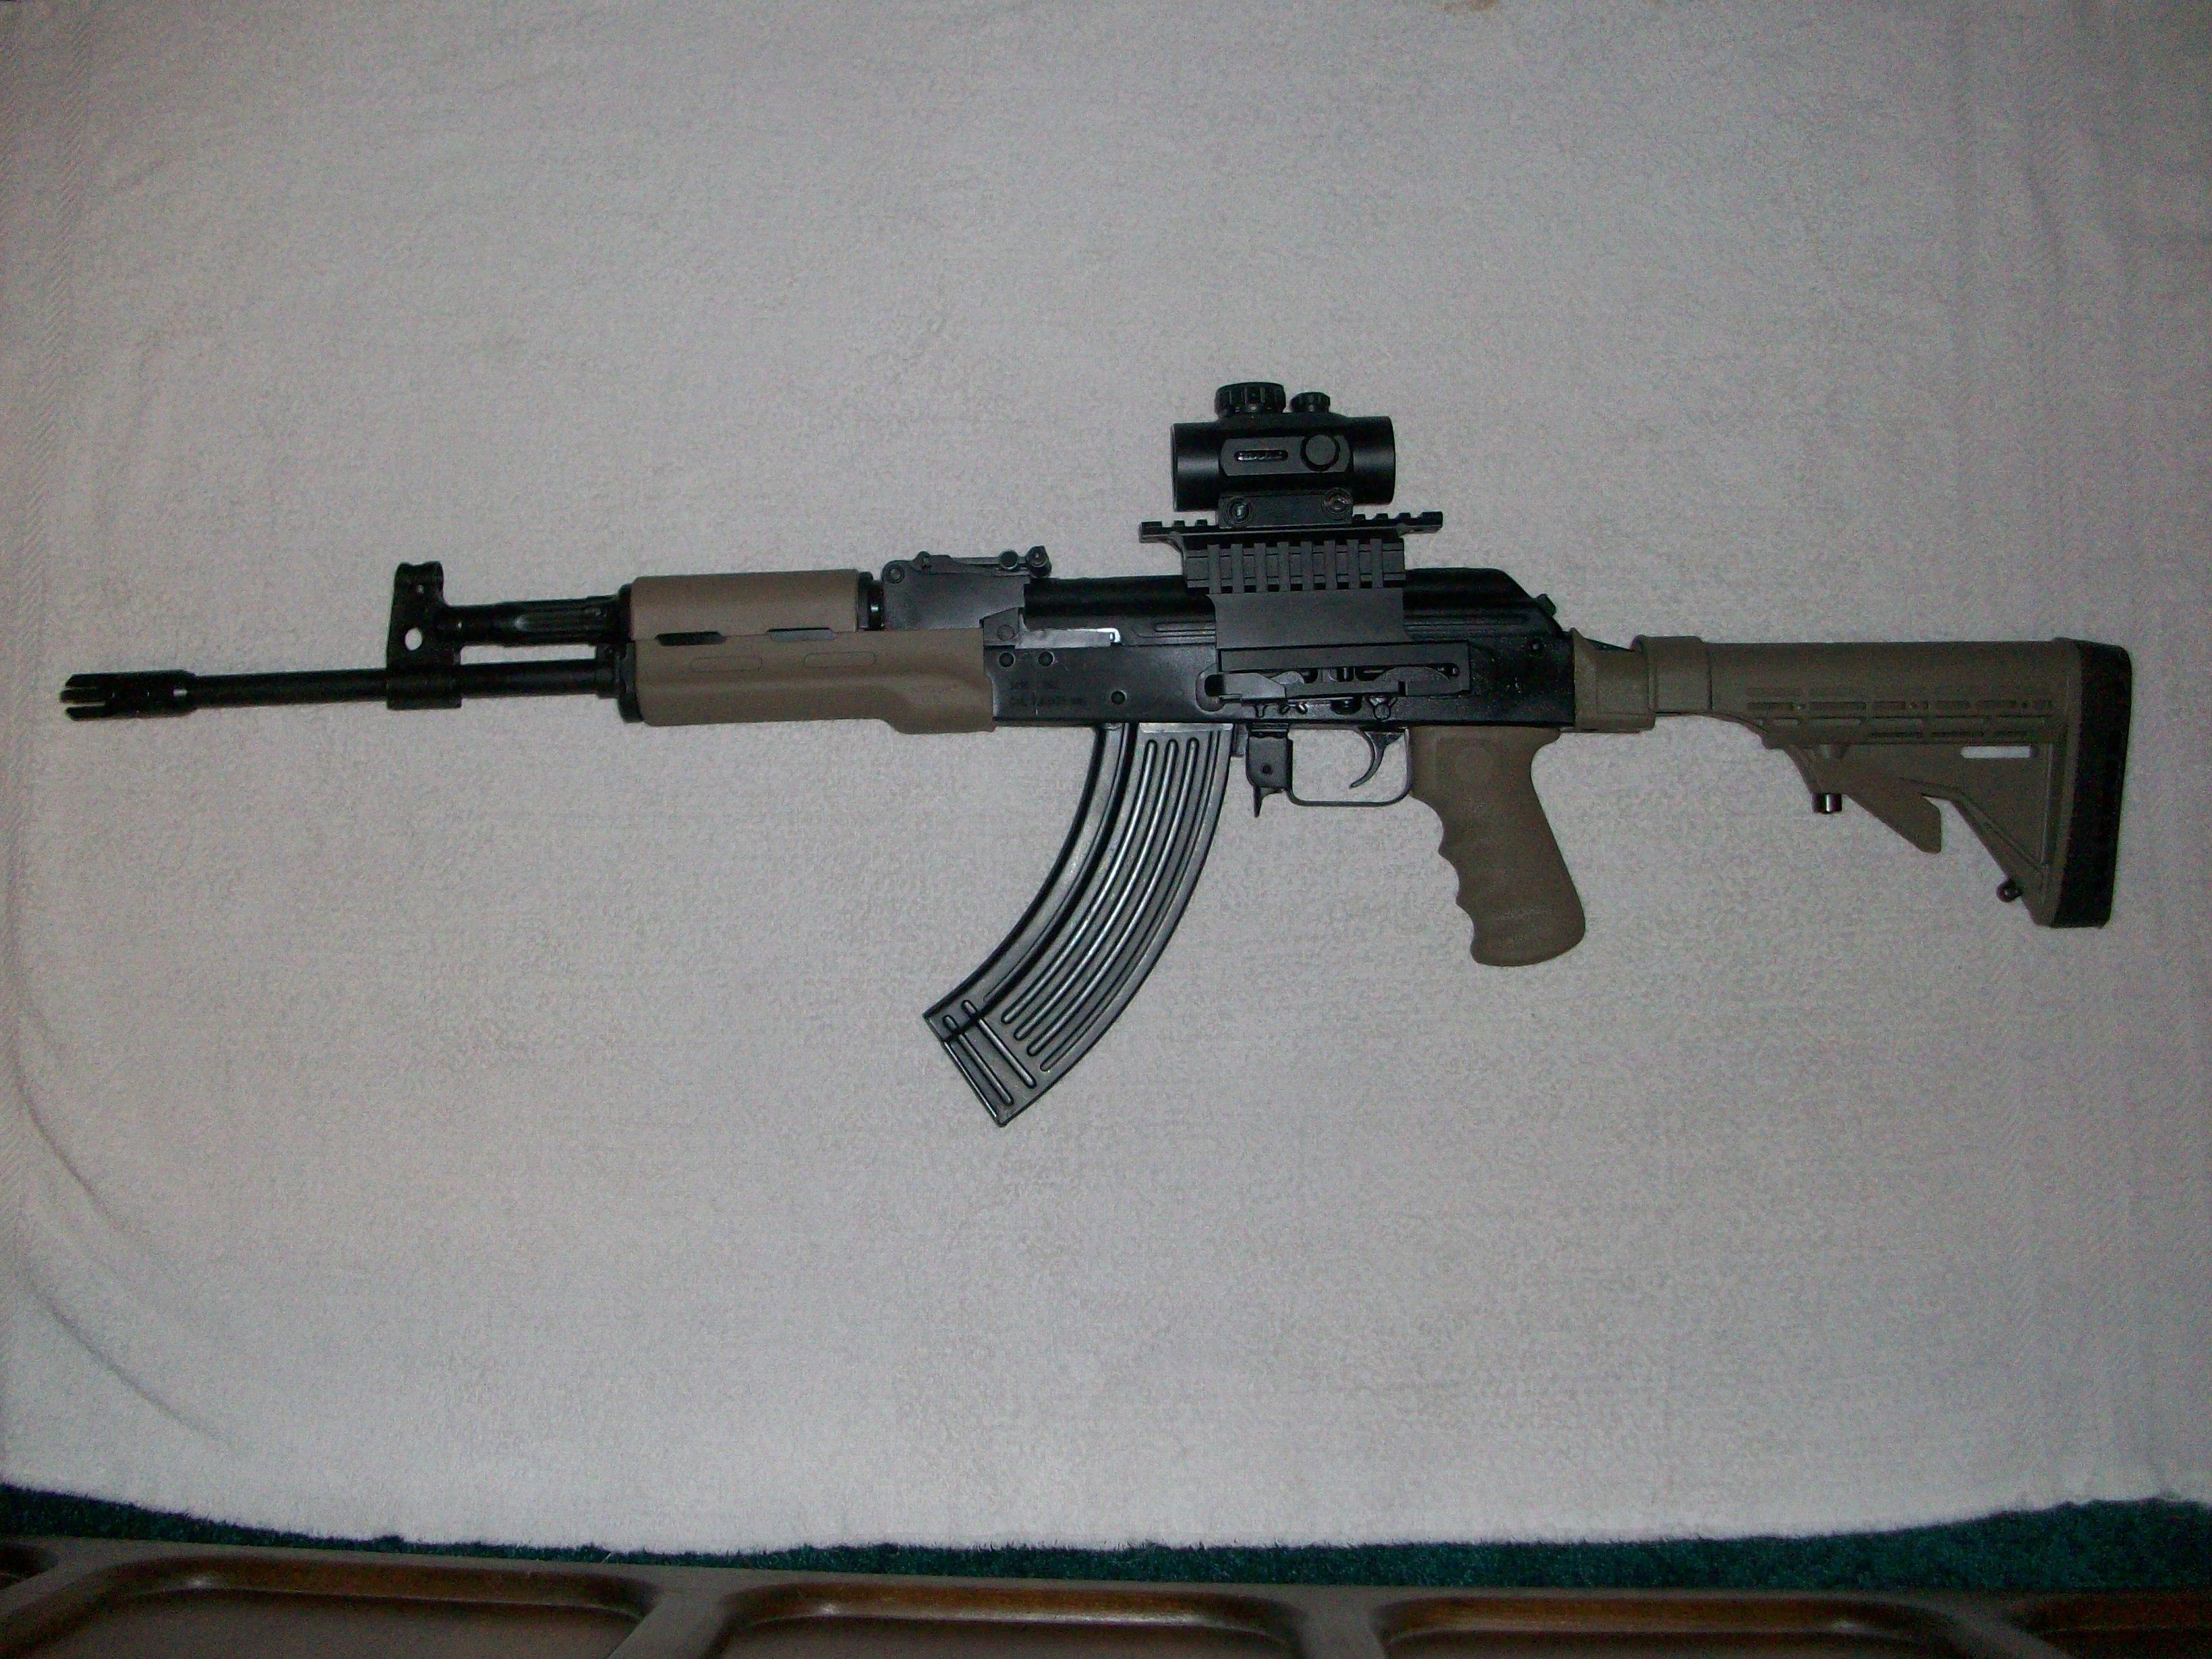 AK optics mounting?-akm10.jpg